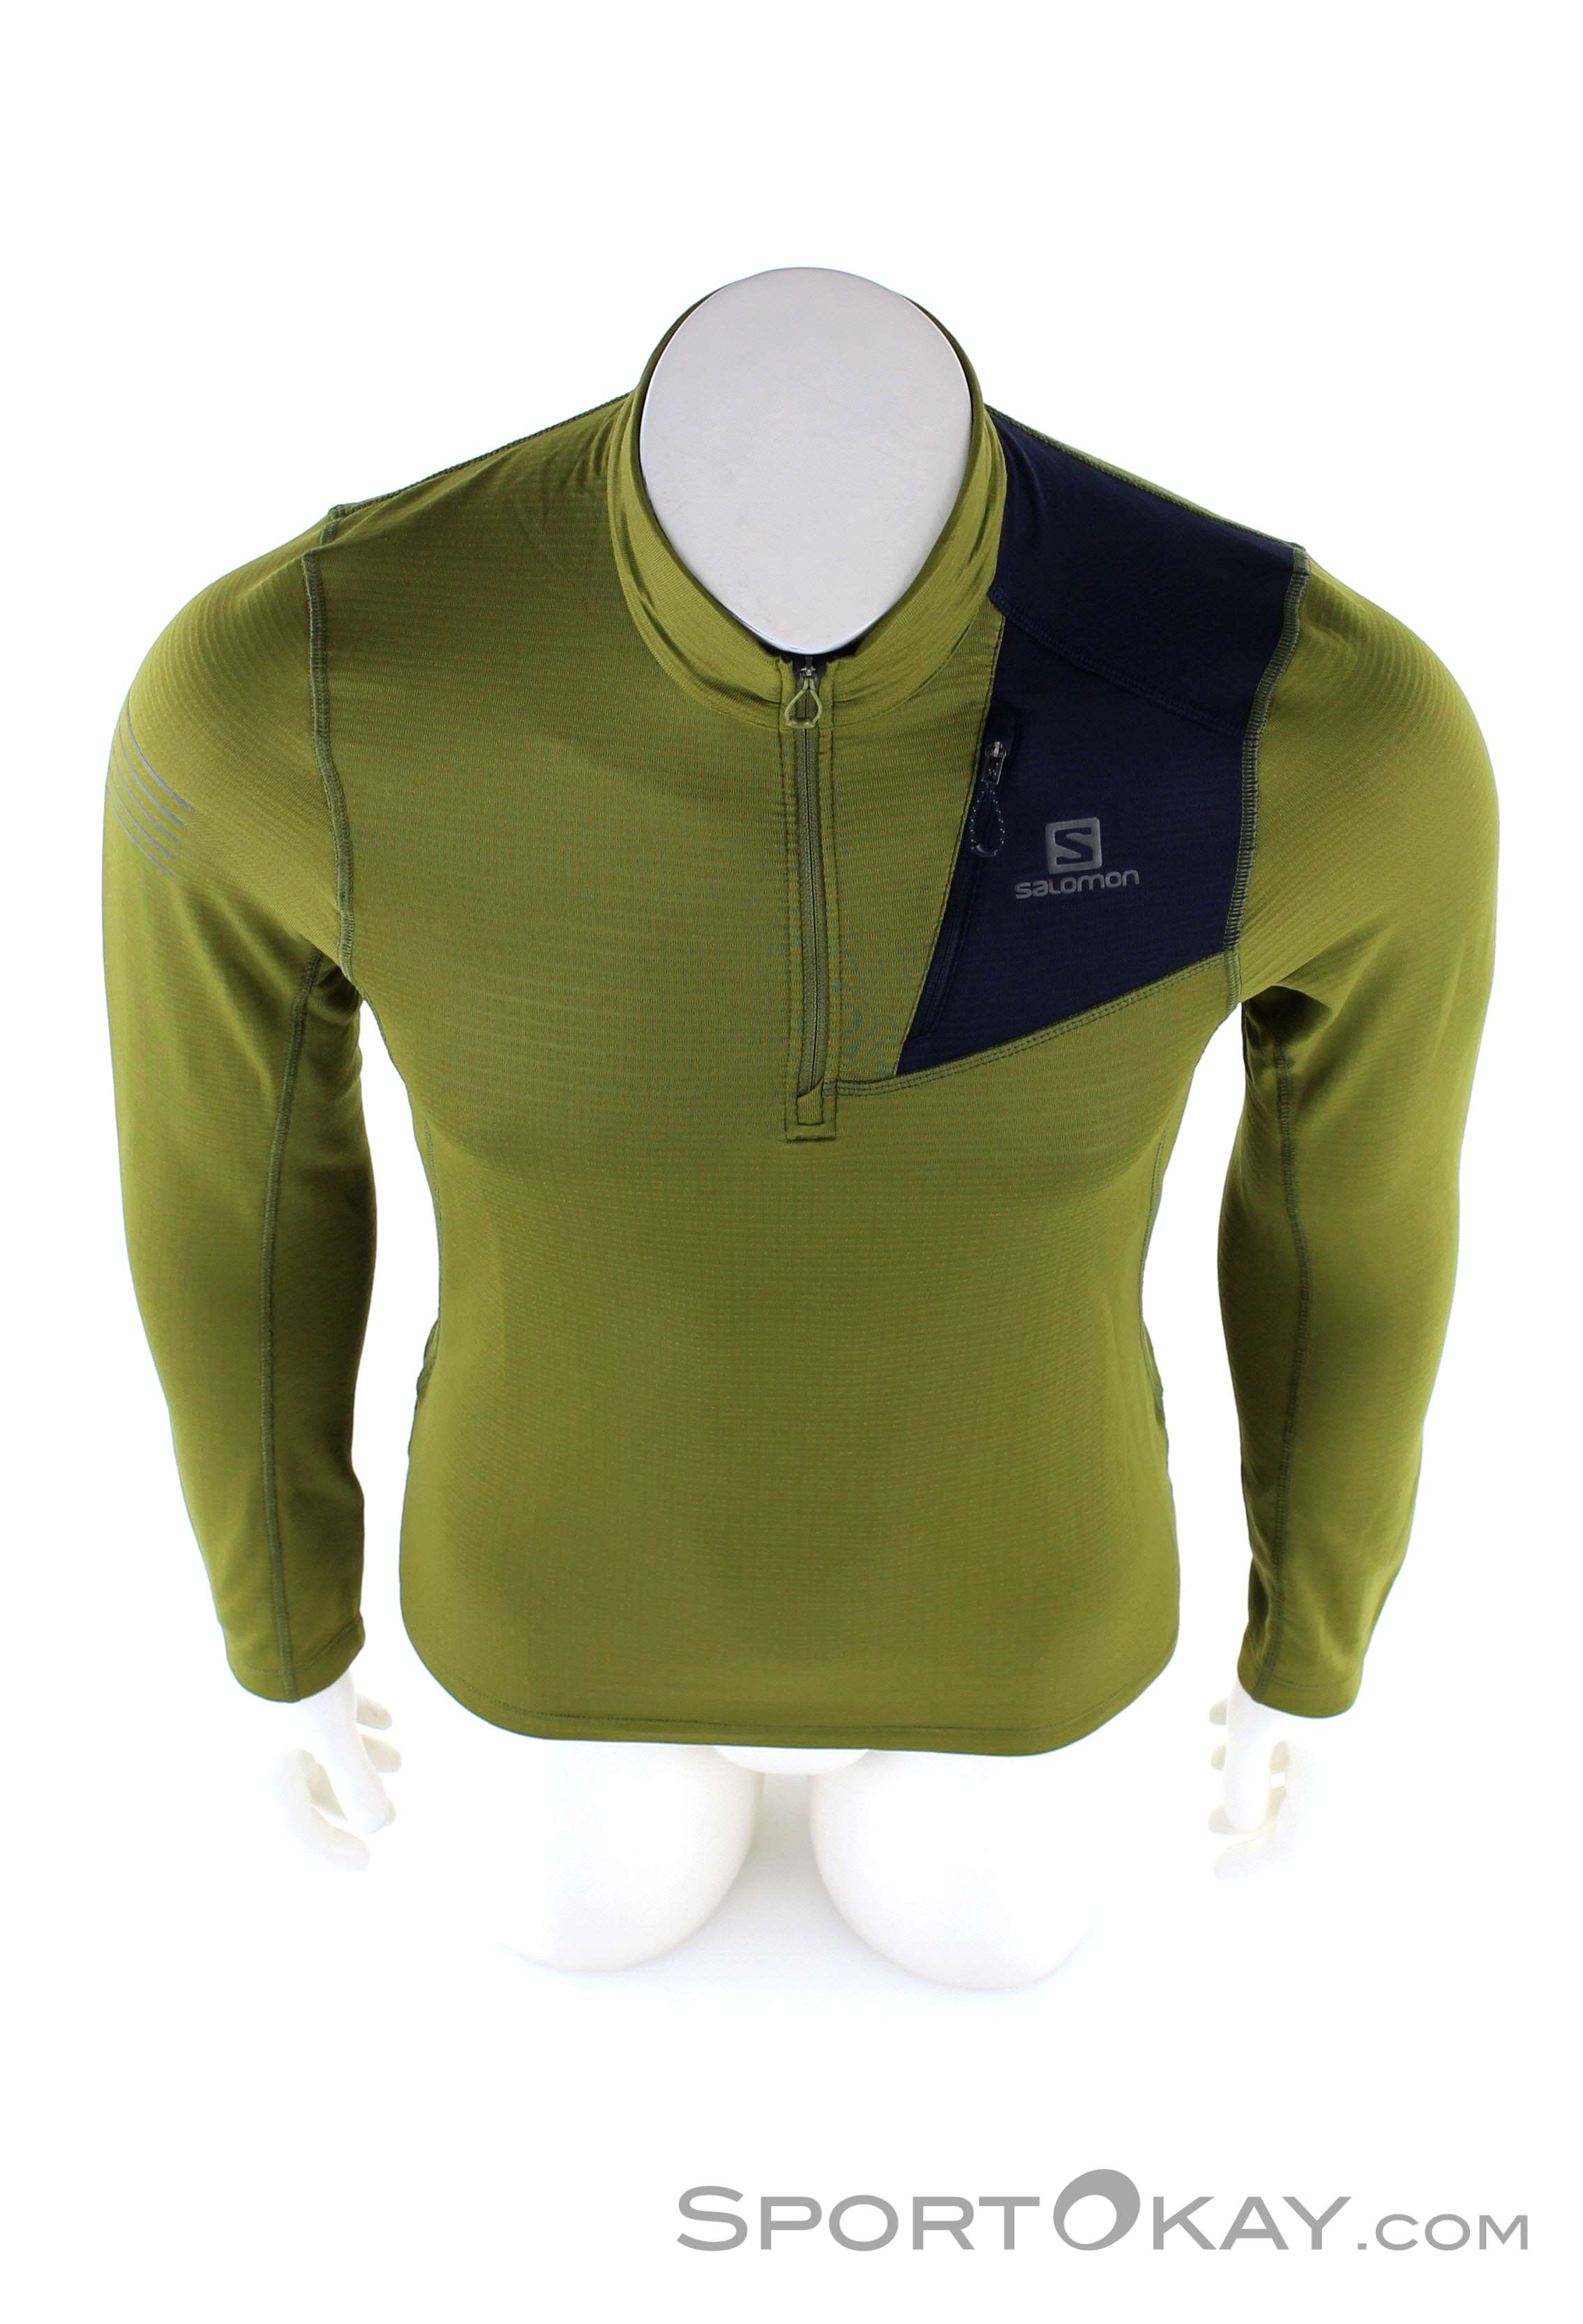 Salomon Salomon Grid Hz Mid Mens Functional Shirt